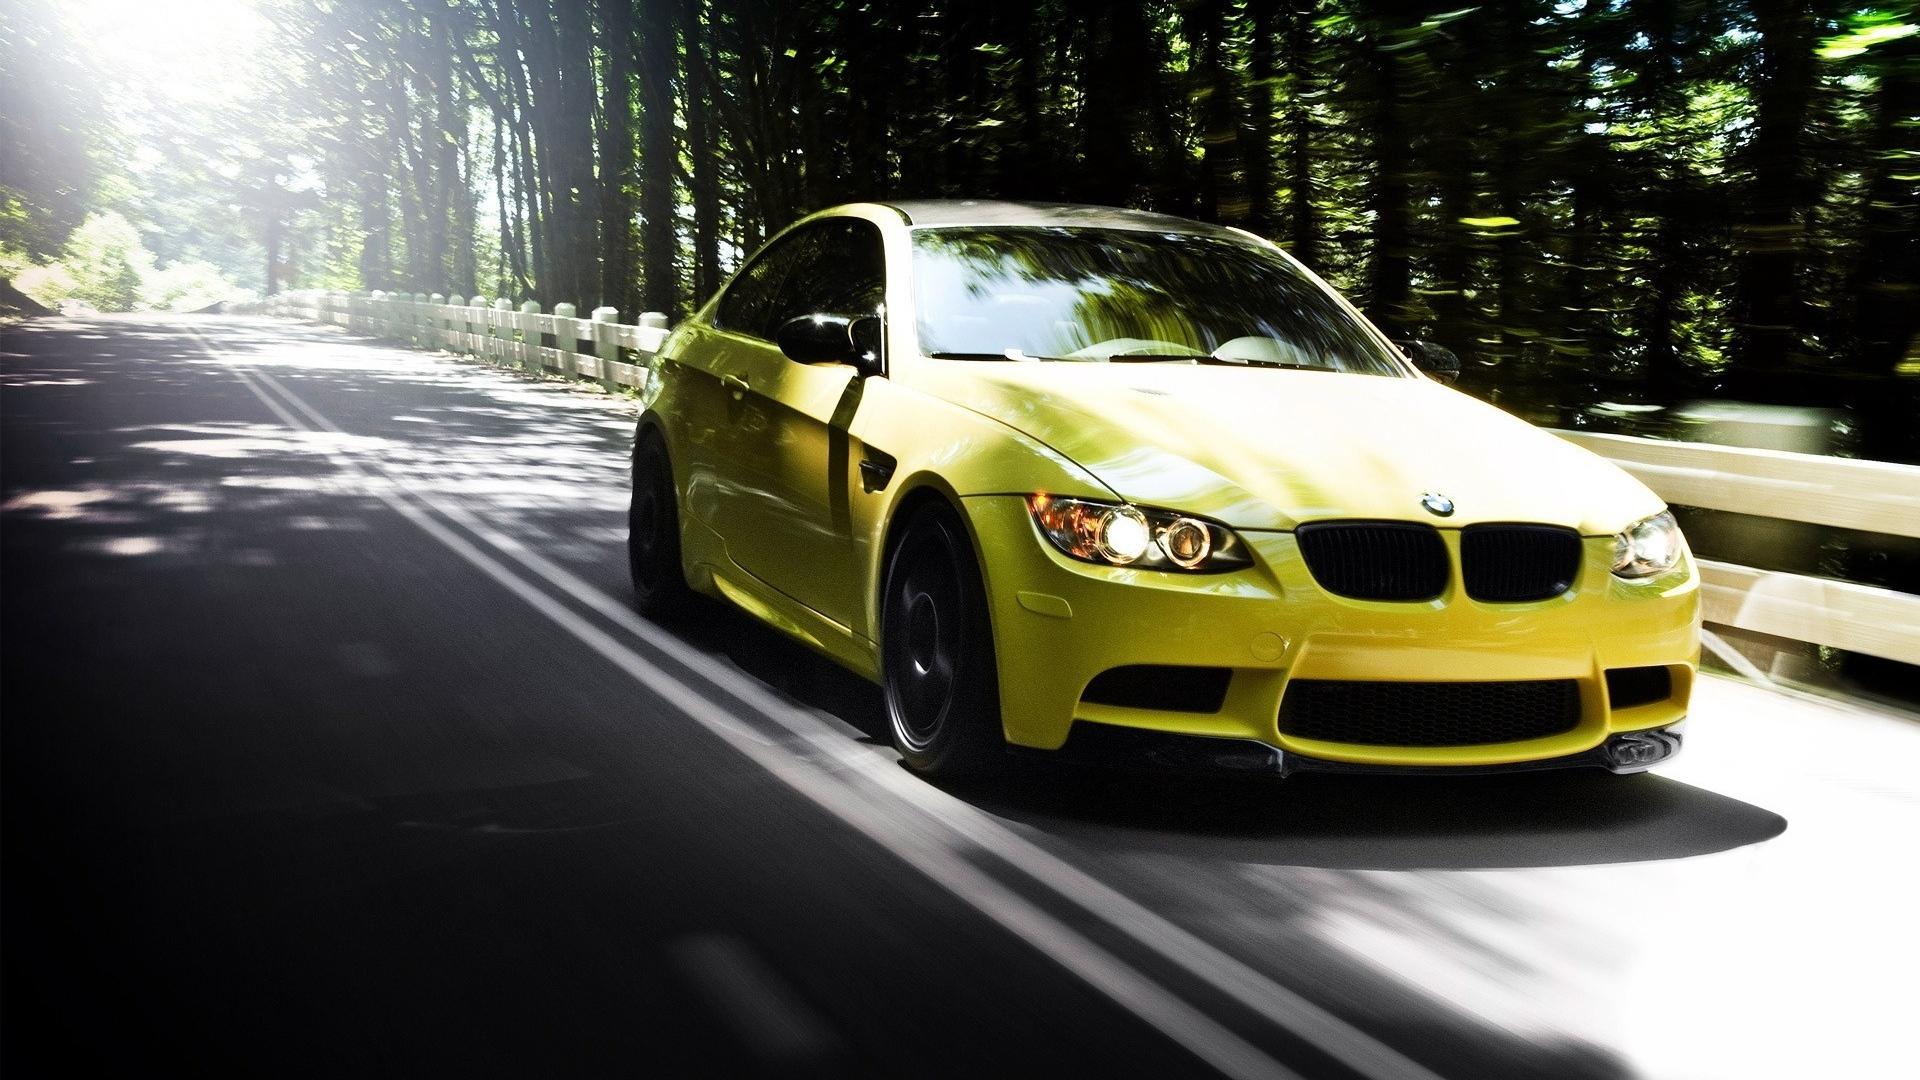 1080p Muscle Car Wallpaper Free Cars Full Hd Images 1080p Pixelstalk Net